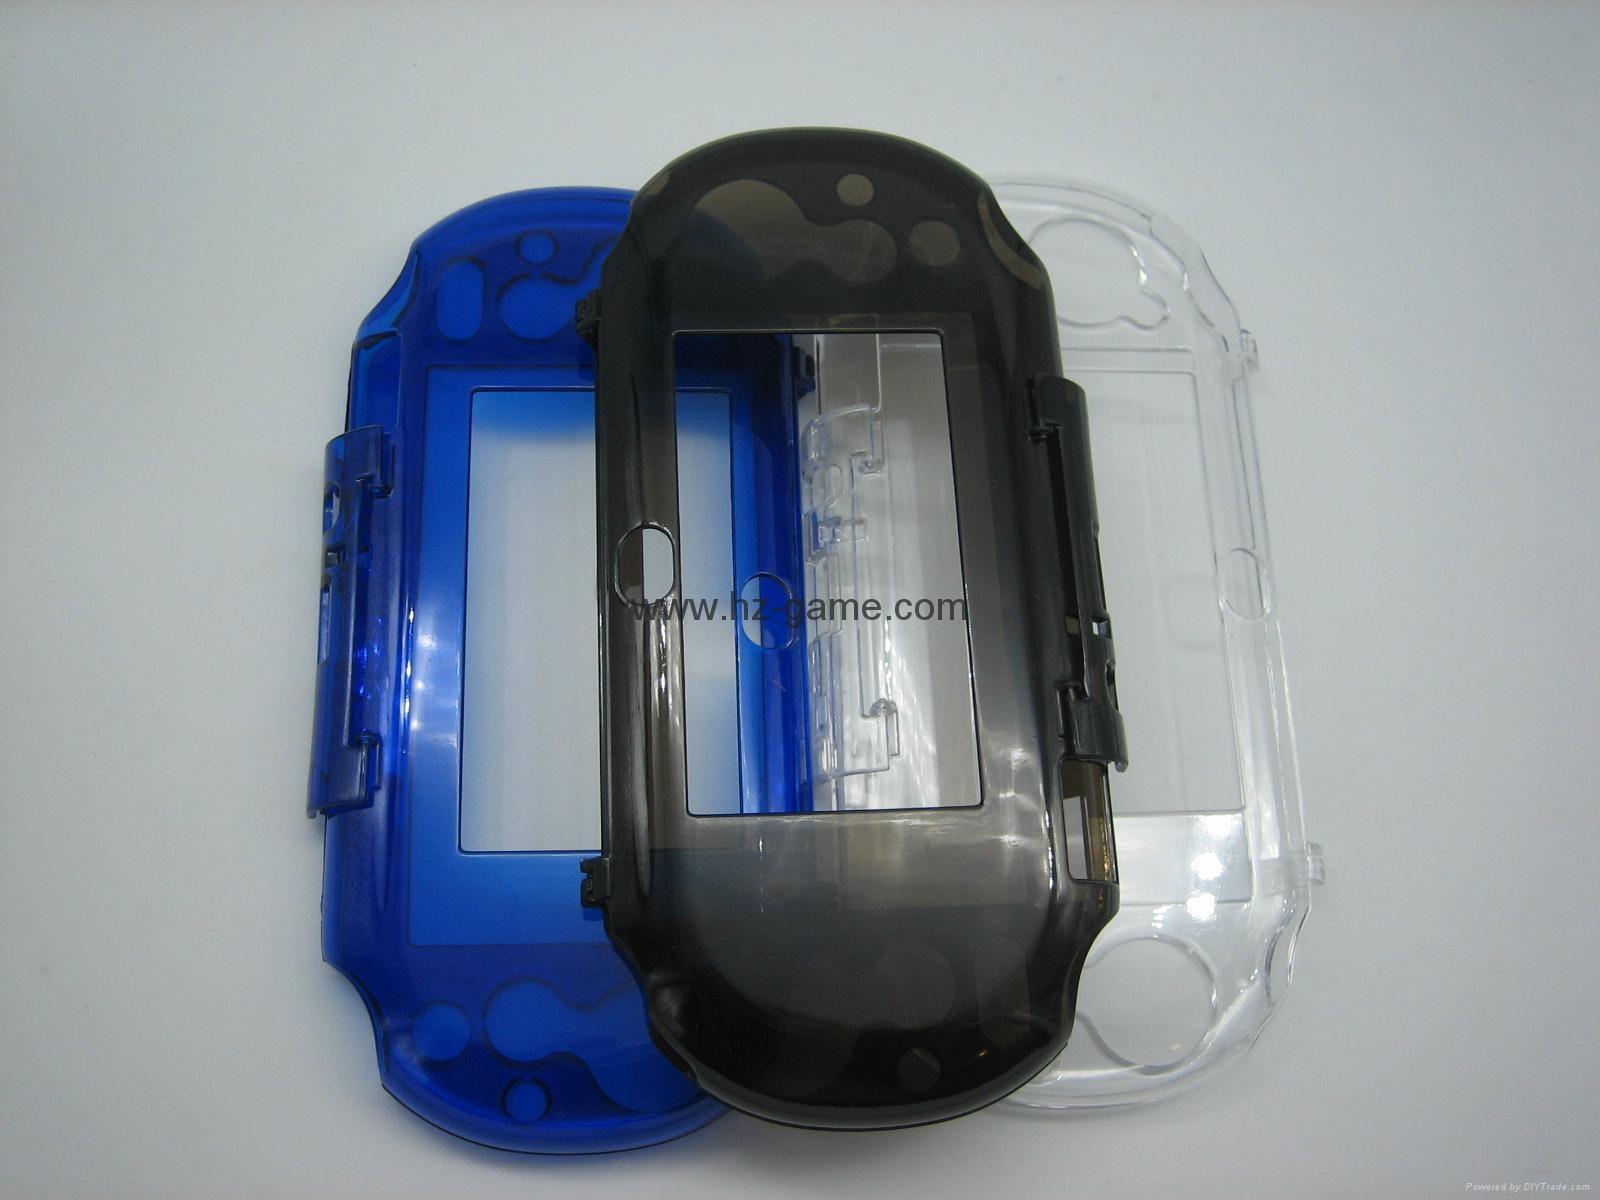 PSV配件手柄手把,格斗手柄 PSVita 弧形手柄,psp全套机壳,psvita保护壳 5